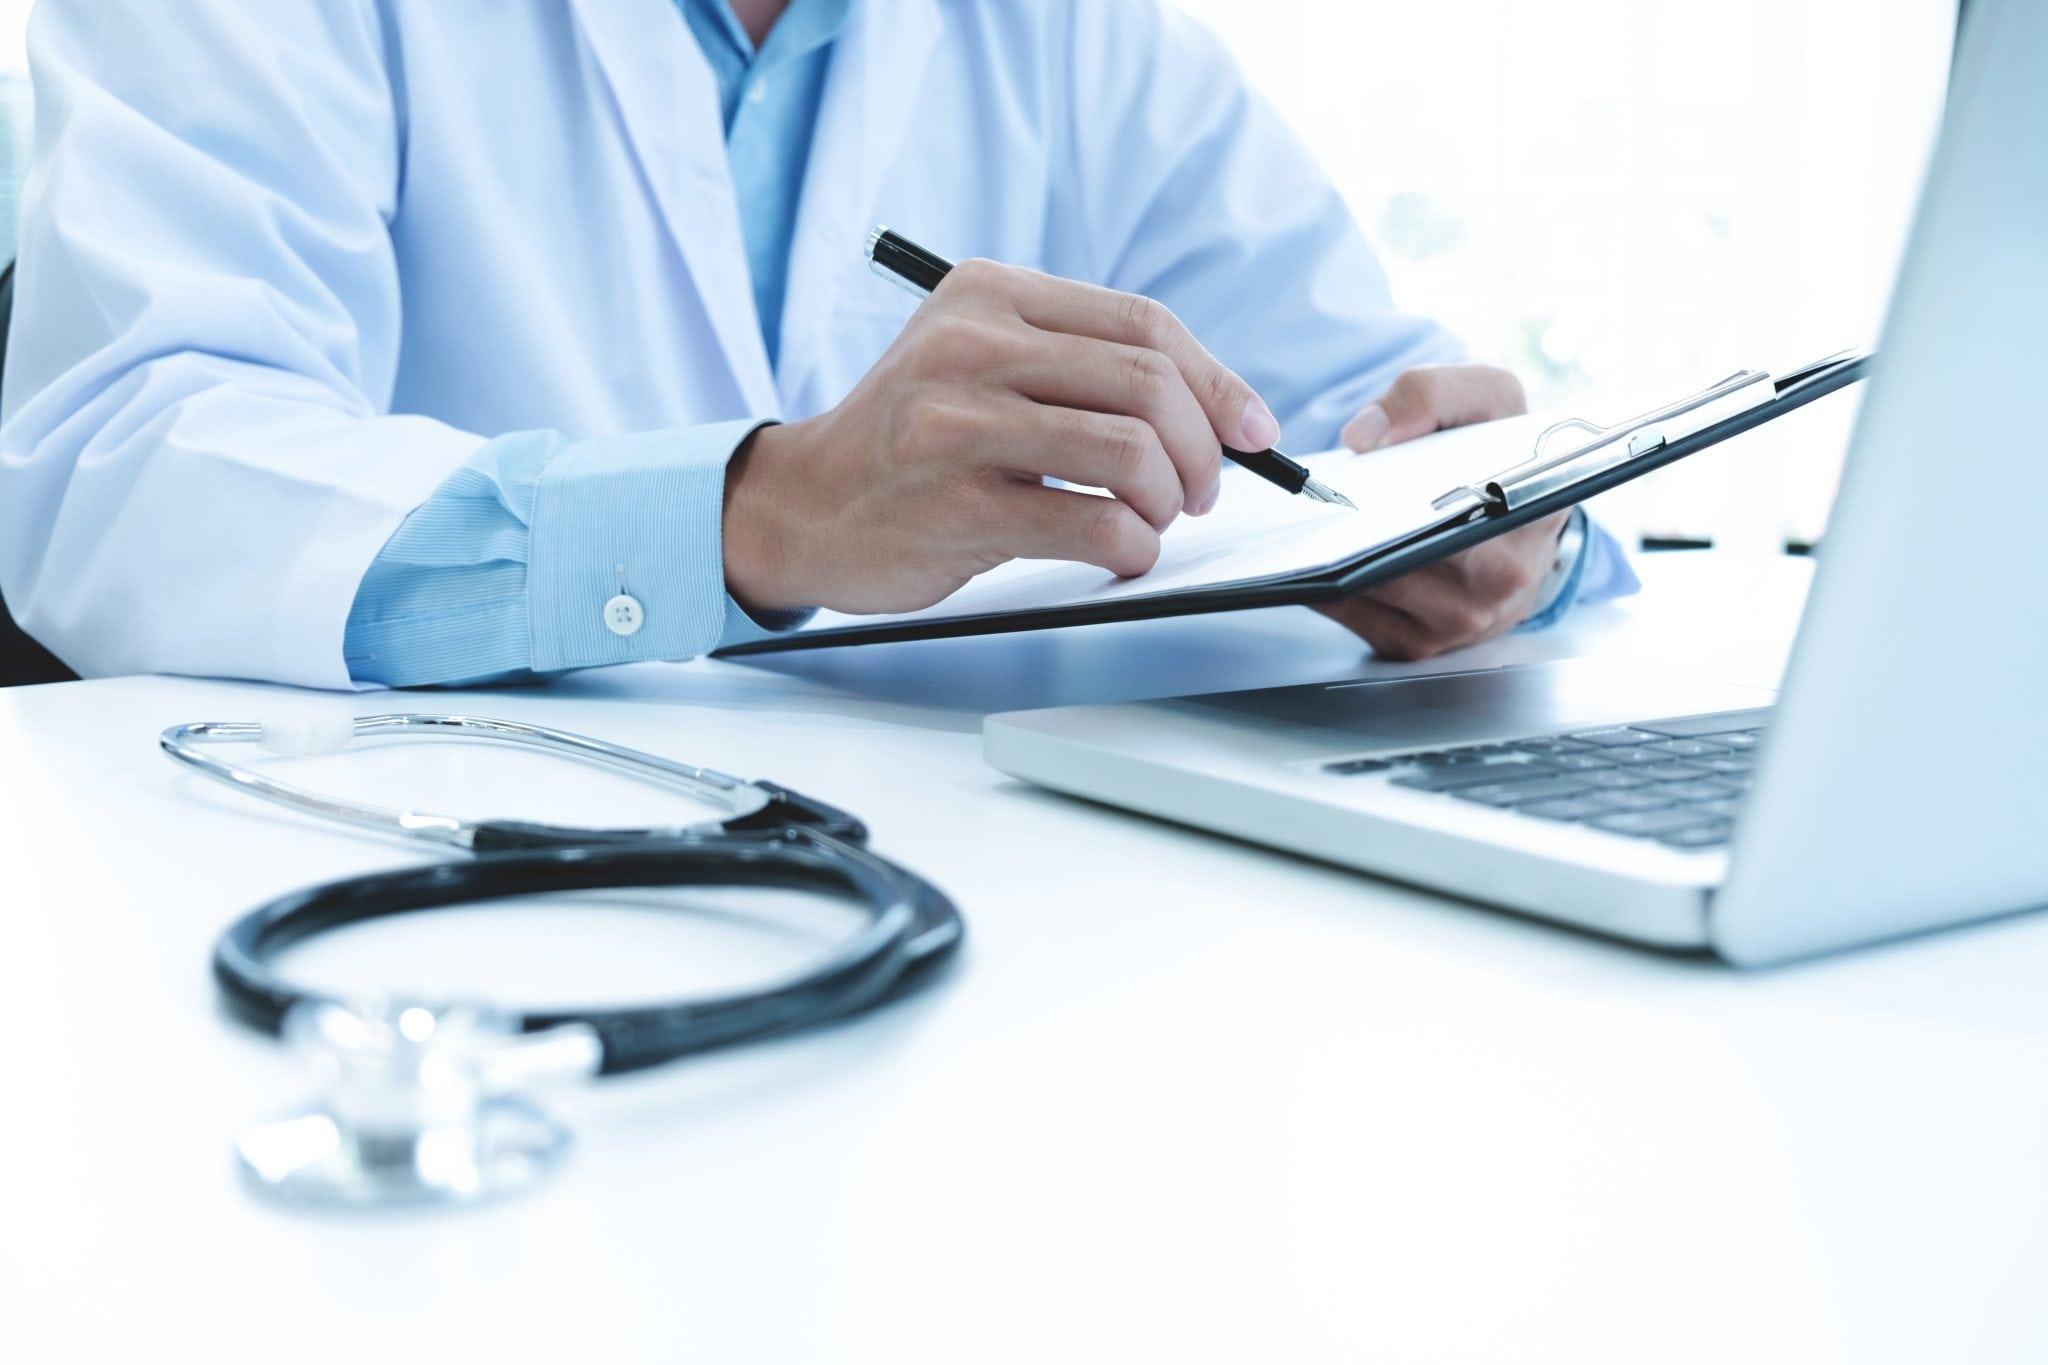 procedimiento de stent de próstata